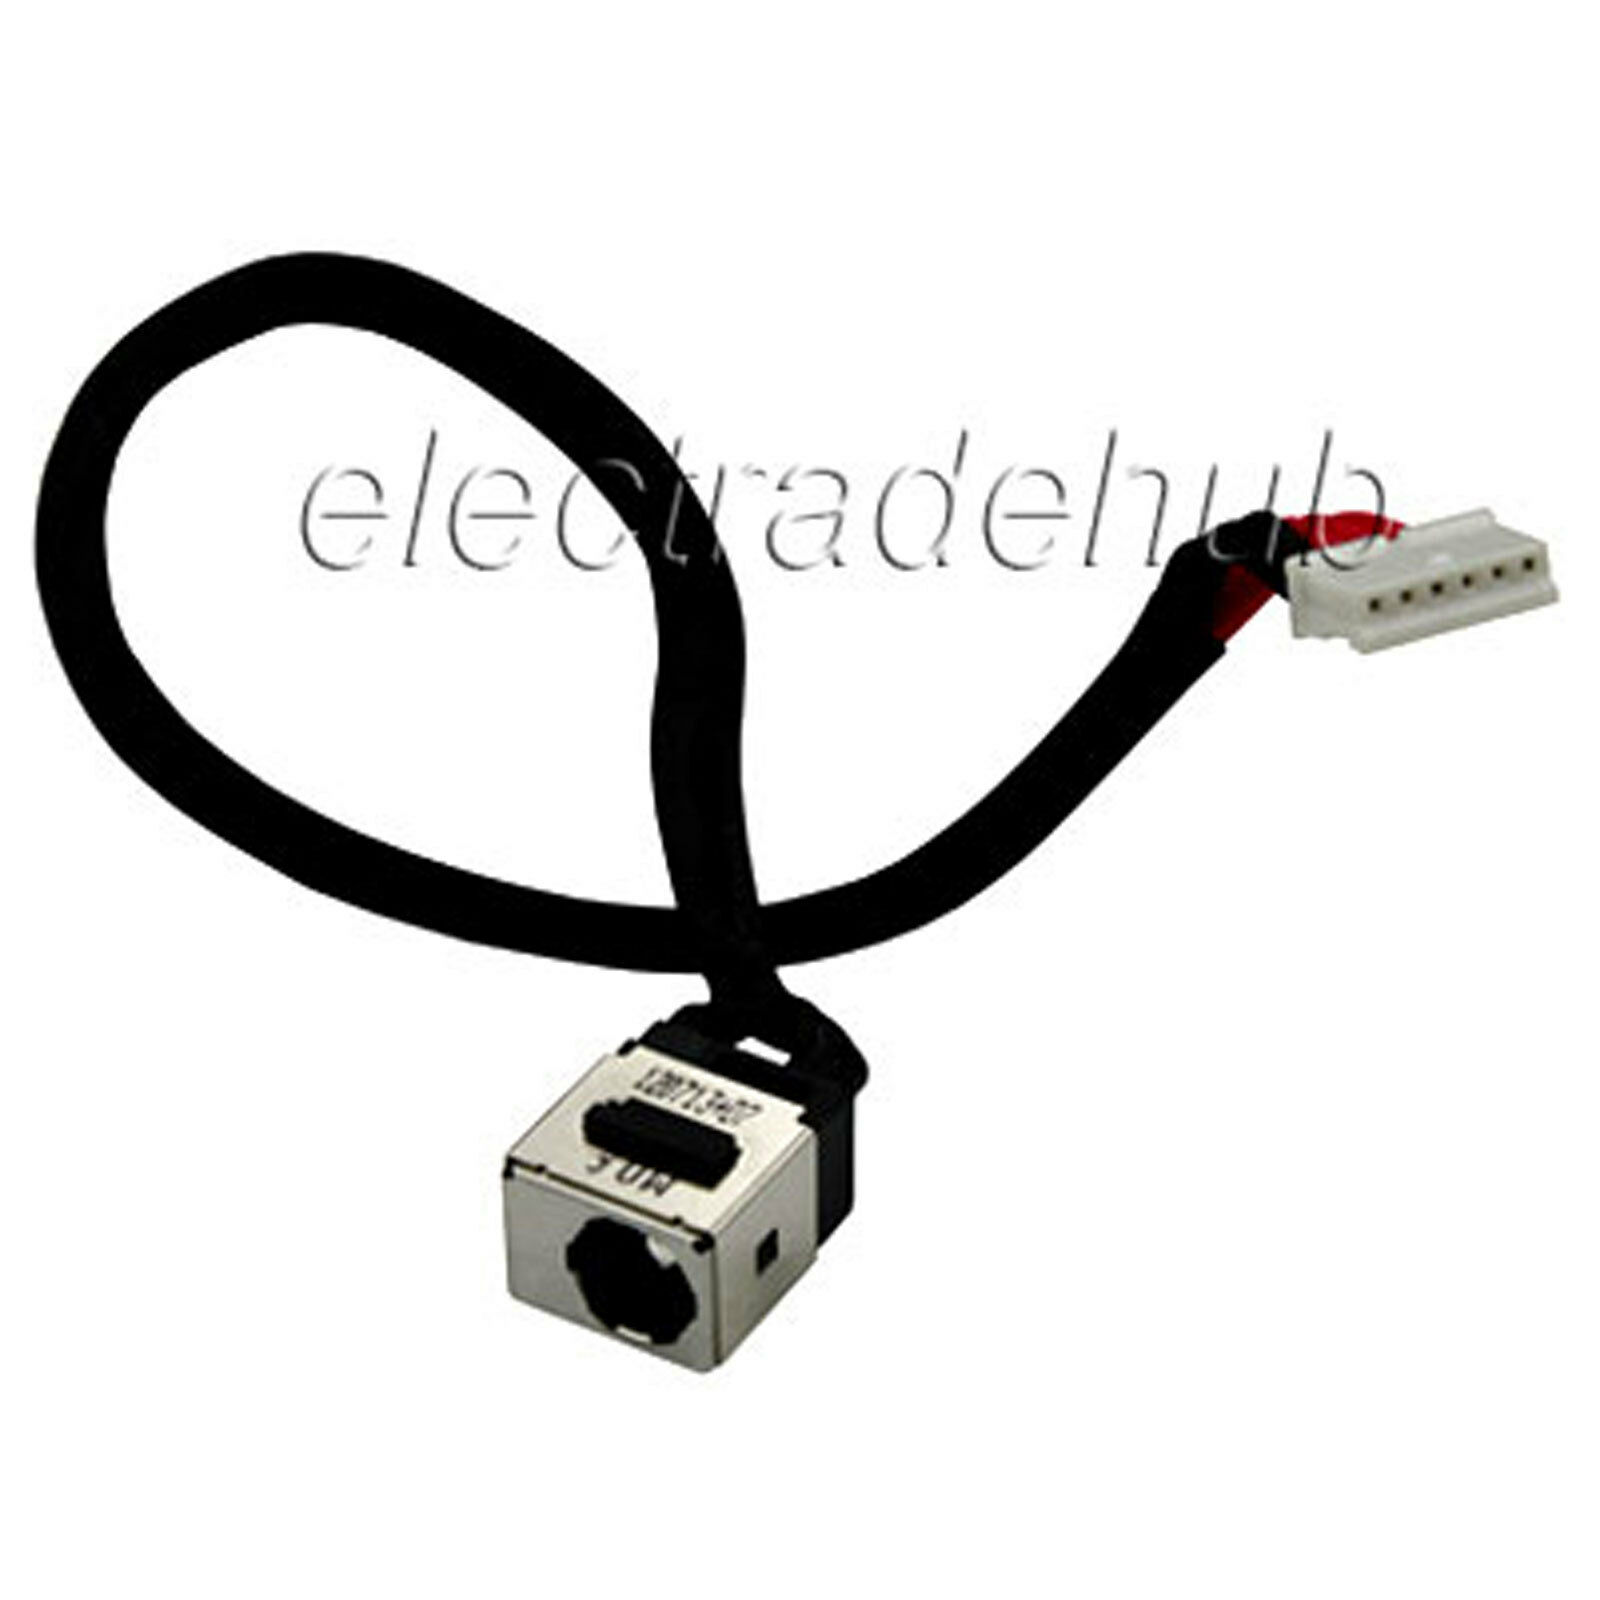 Ibm Lenovo Ideapad Y460p Y460n Y460 Dc Power Jack Socket Cable Harness Cj111